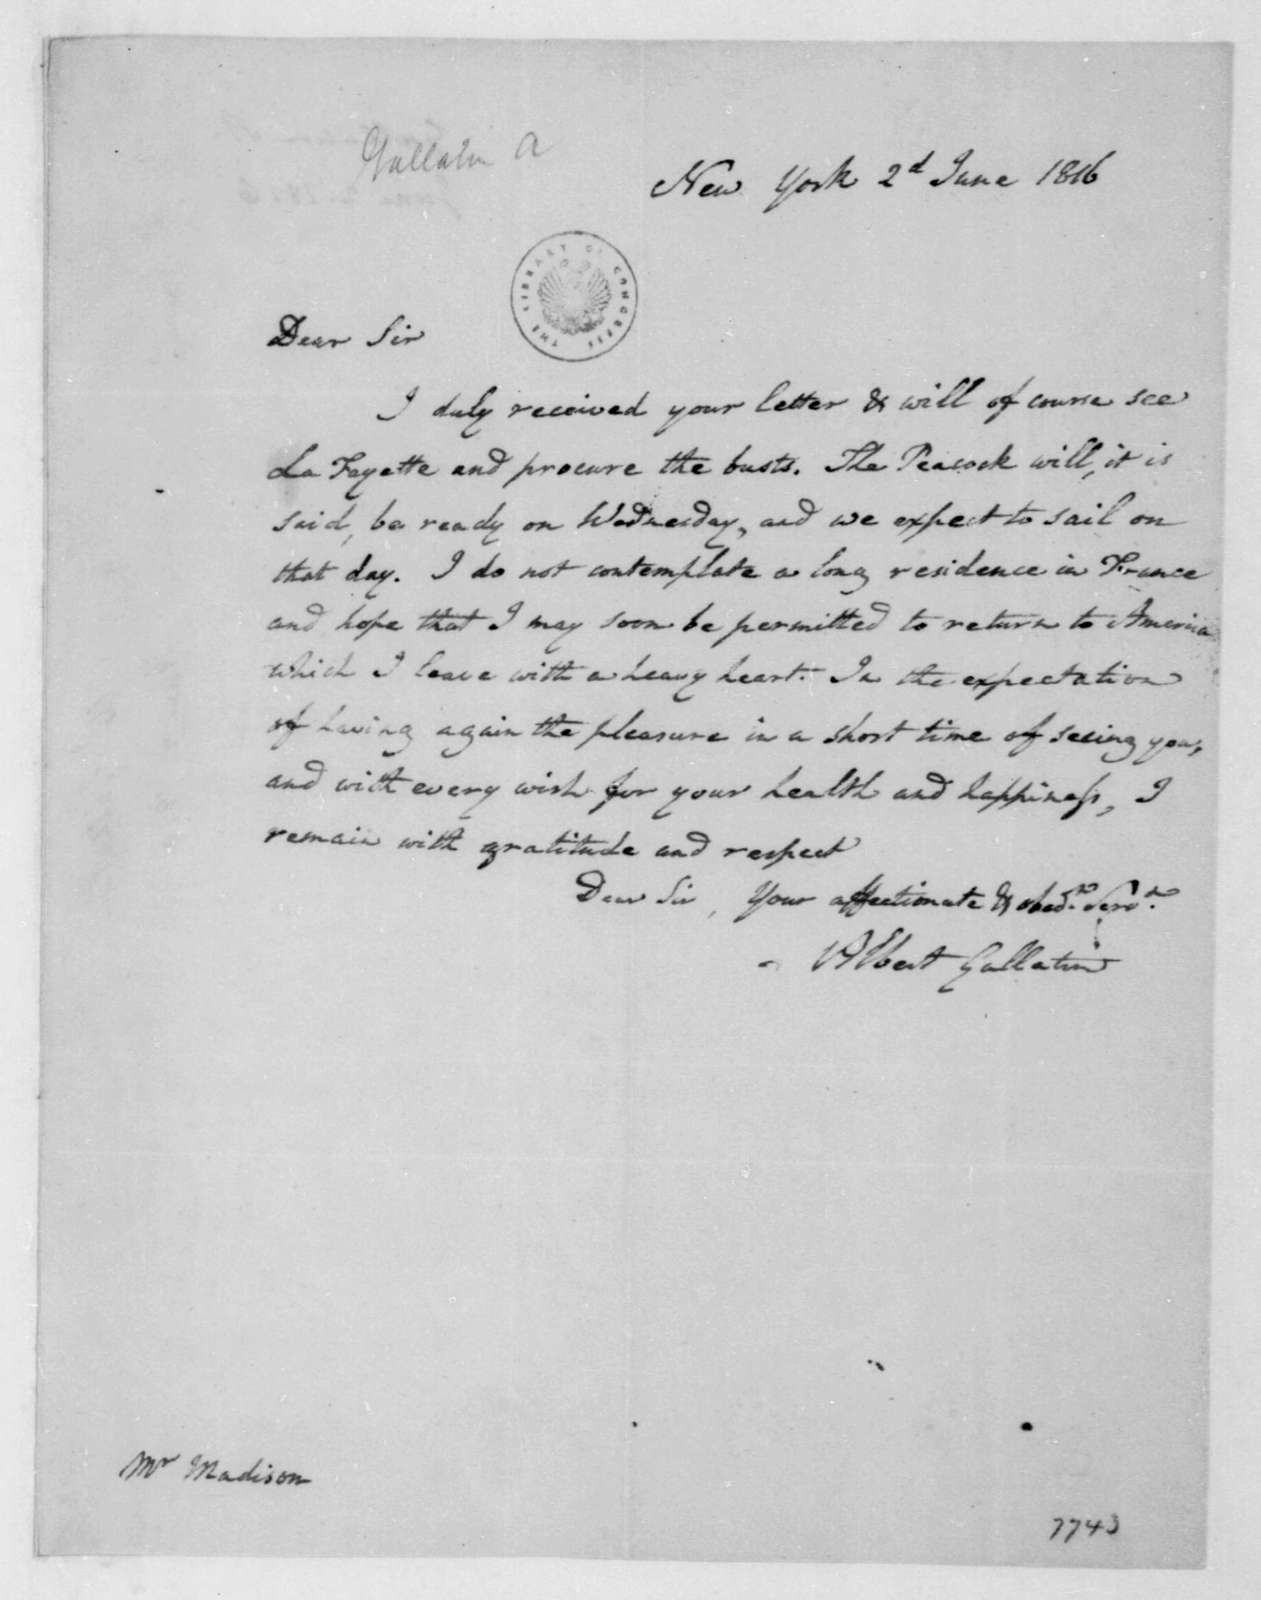 Albert Gallatin to James Madison, June 2, 1816.